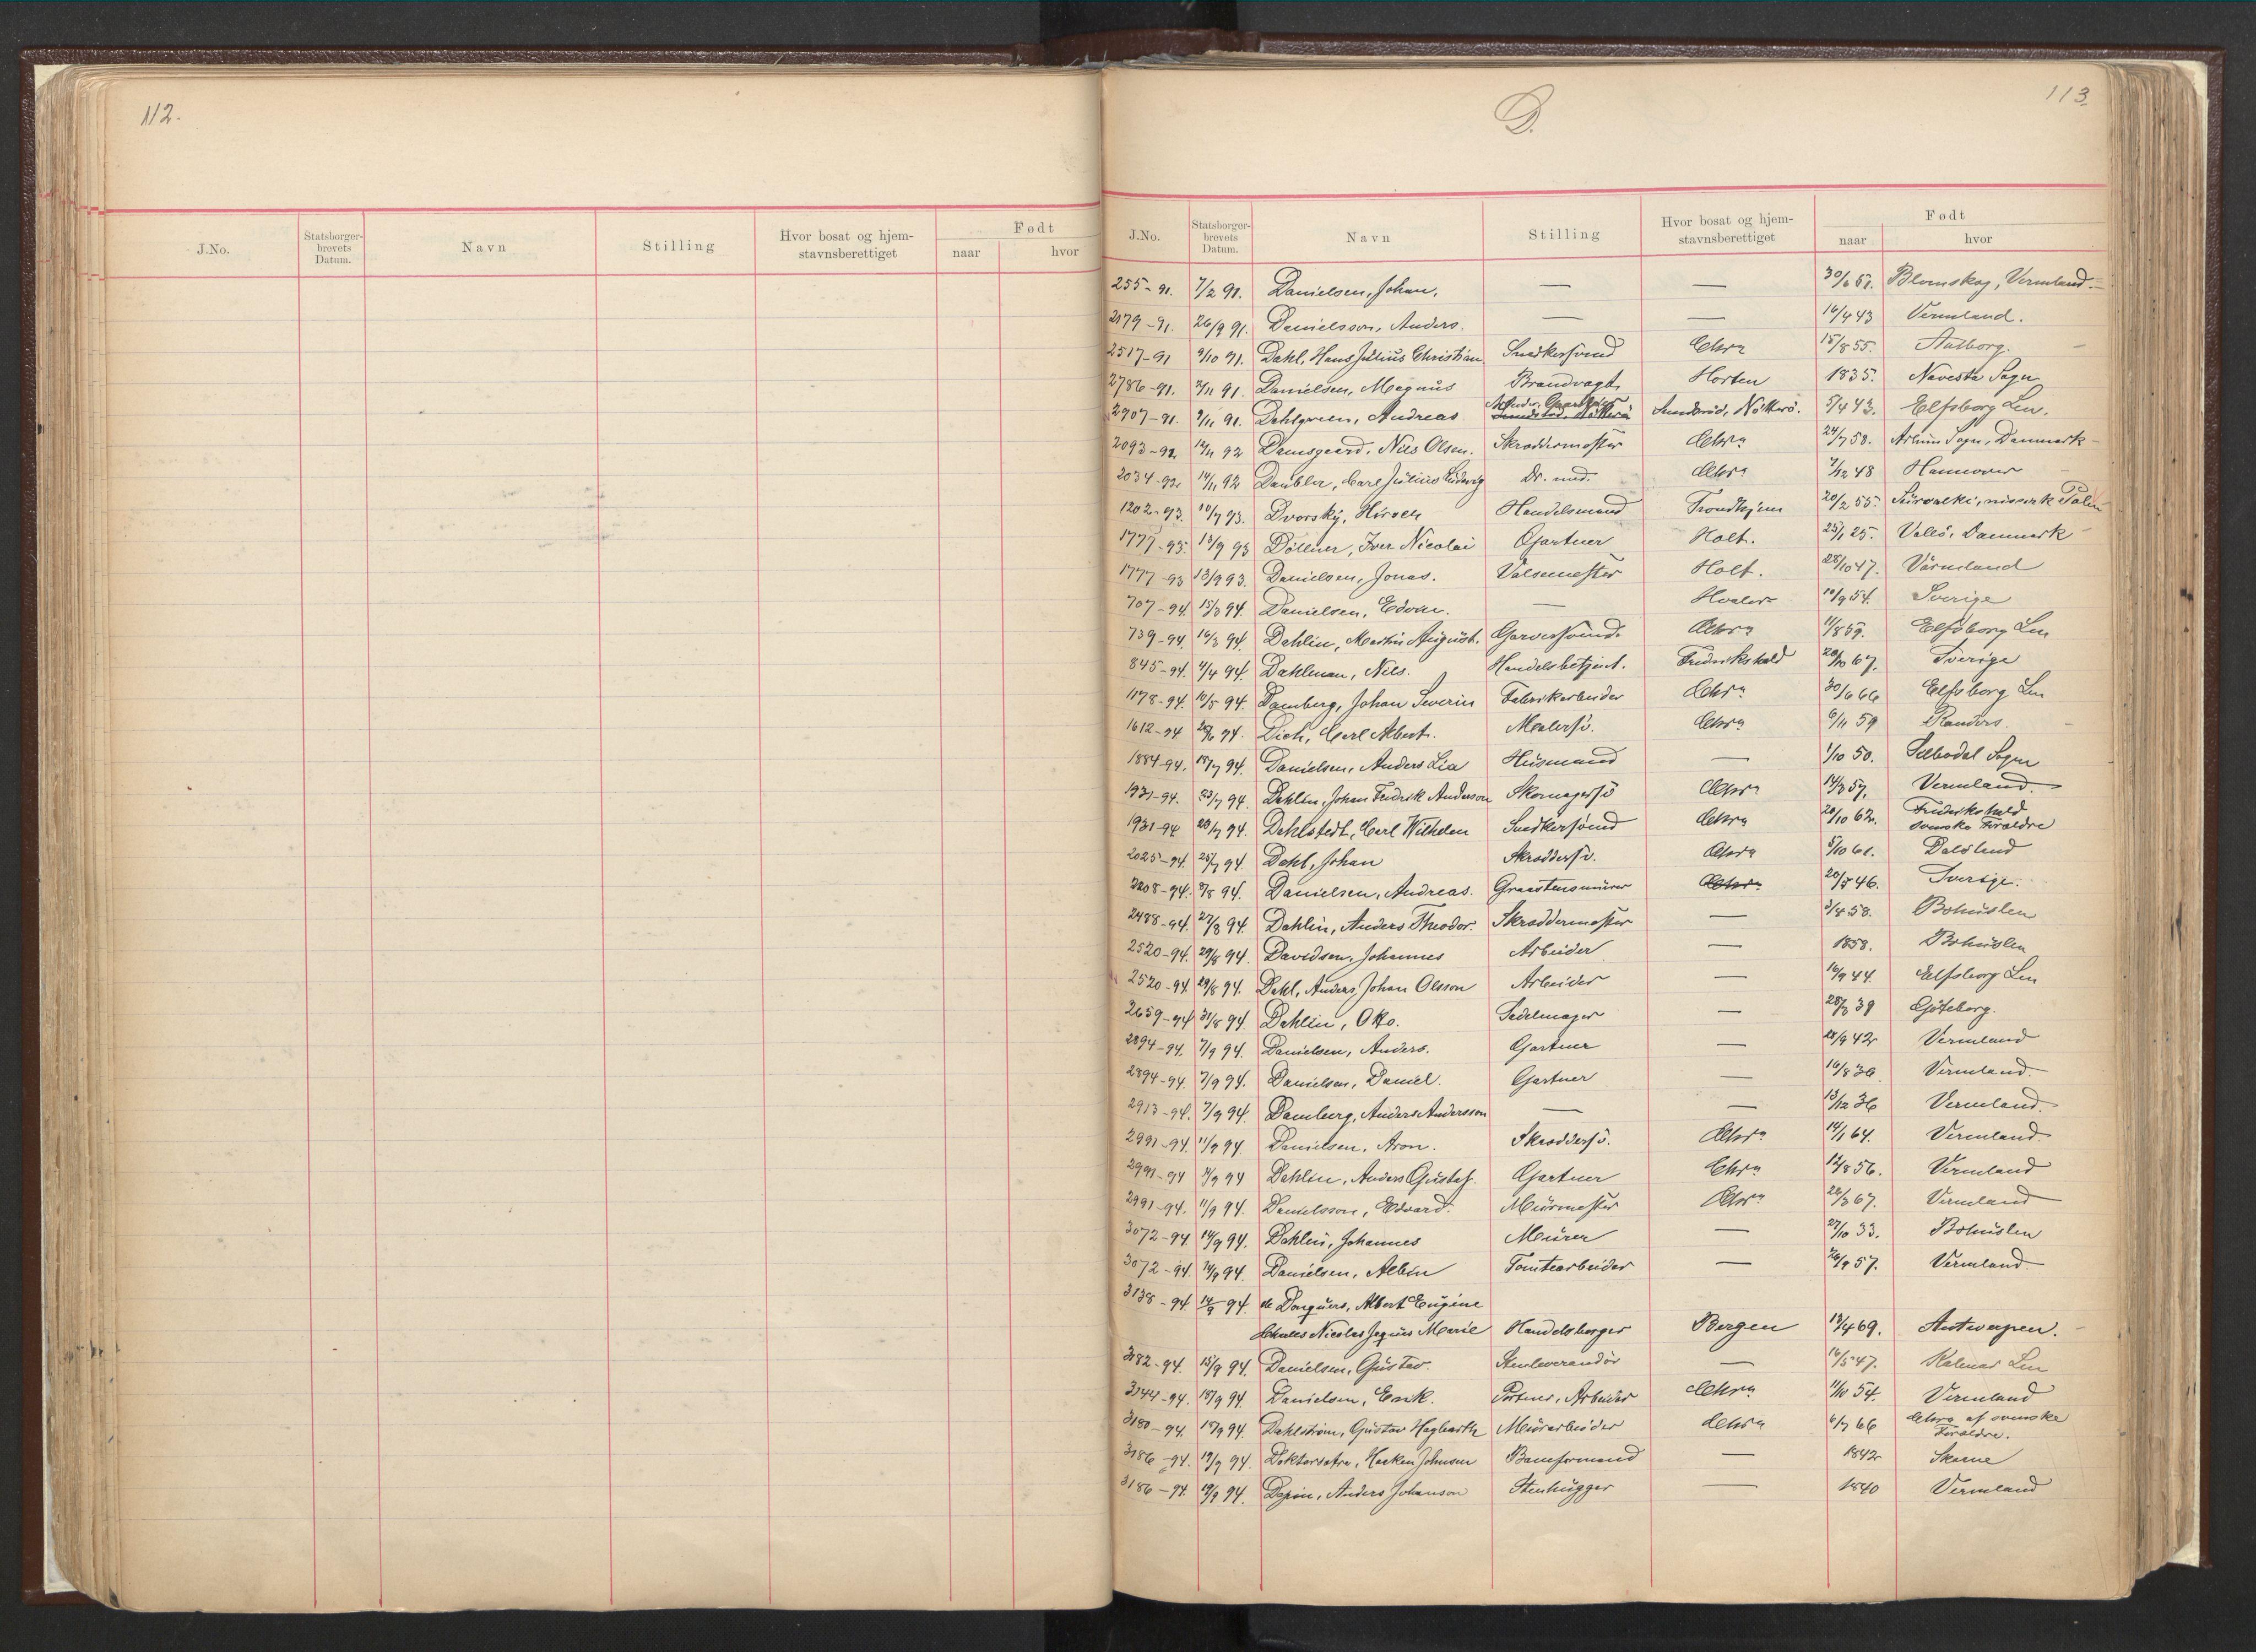 RA, Justisdepartementet, 3. politikontor P3, C/Cc/L0001: Journal over statsborgersaker, 1891-1946, s. 112-113